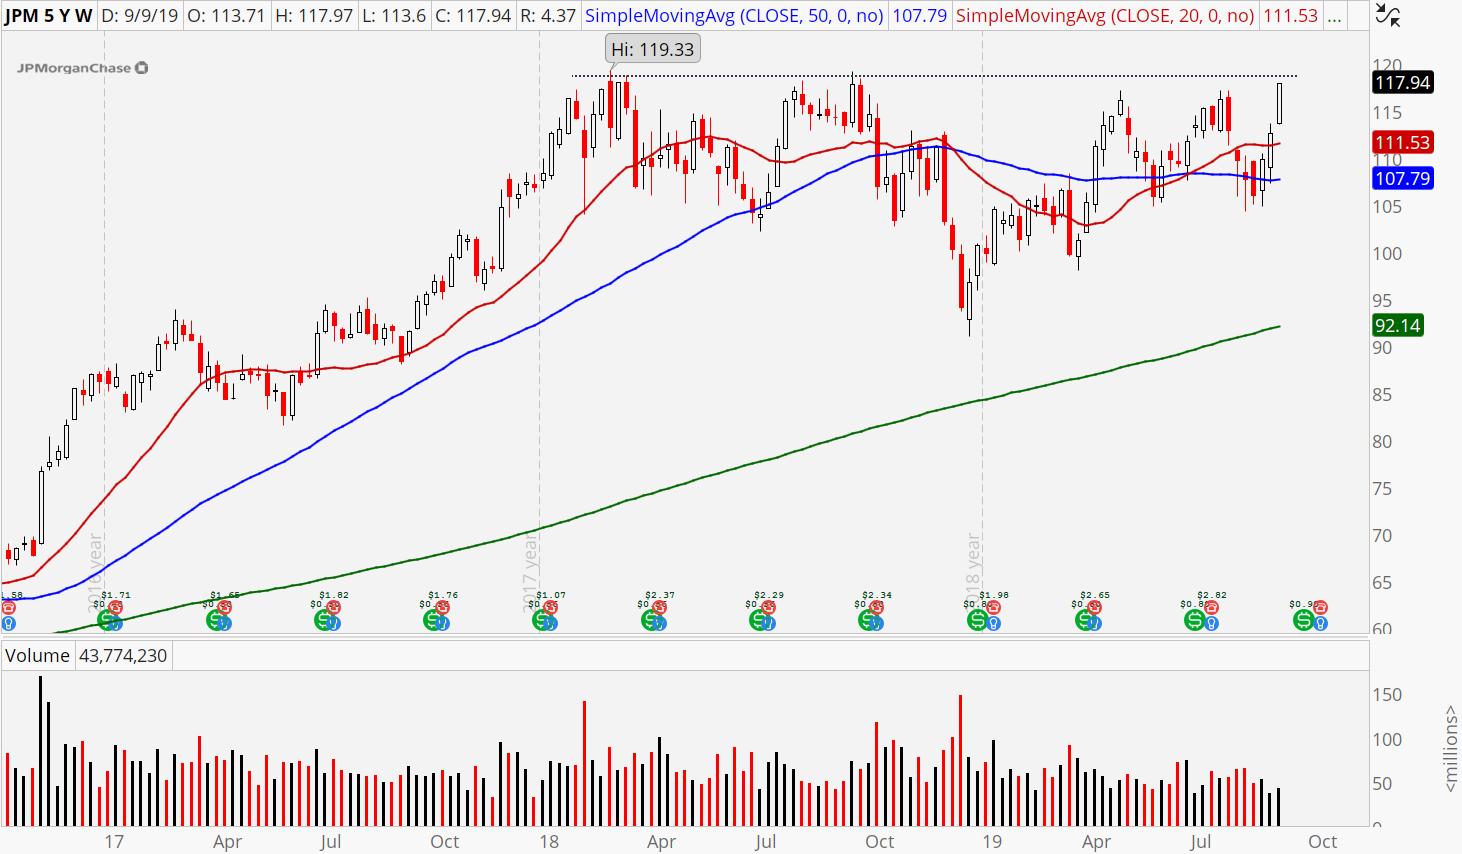 3 Sector Rotation Stocks to Buy: JPMorgan Chase (JPM)